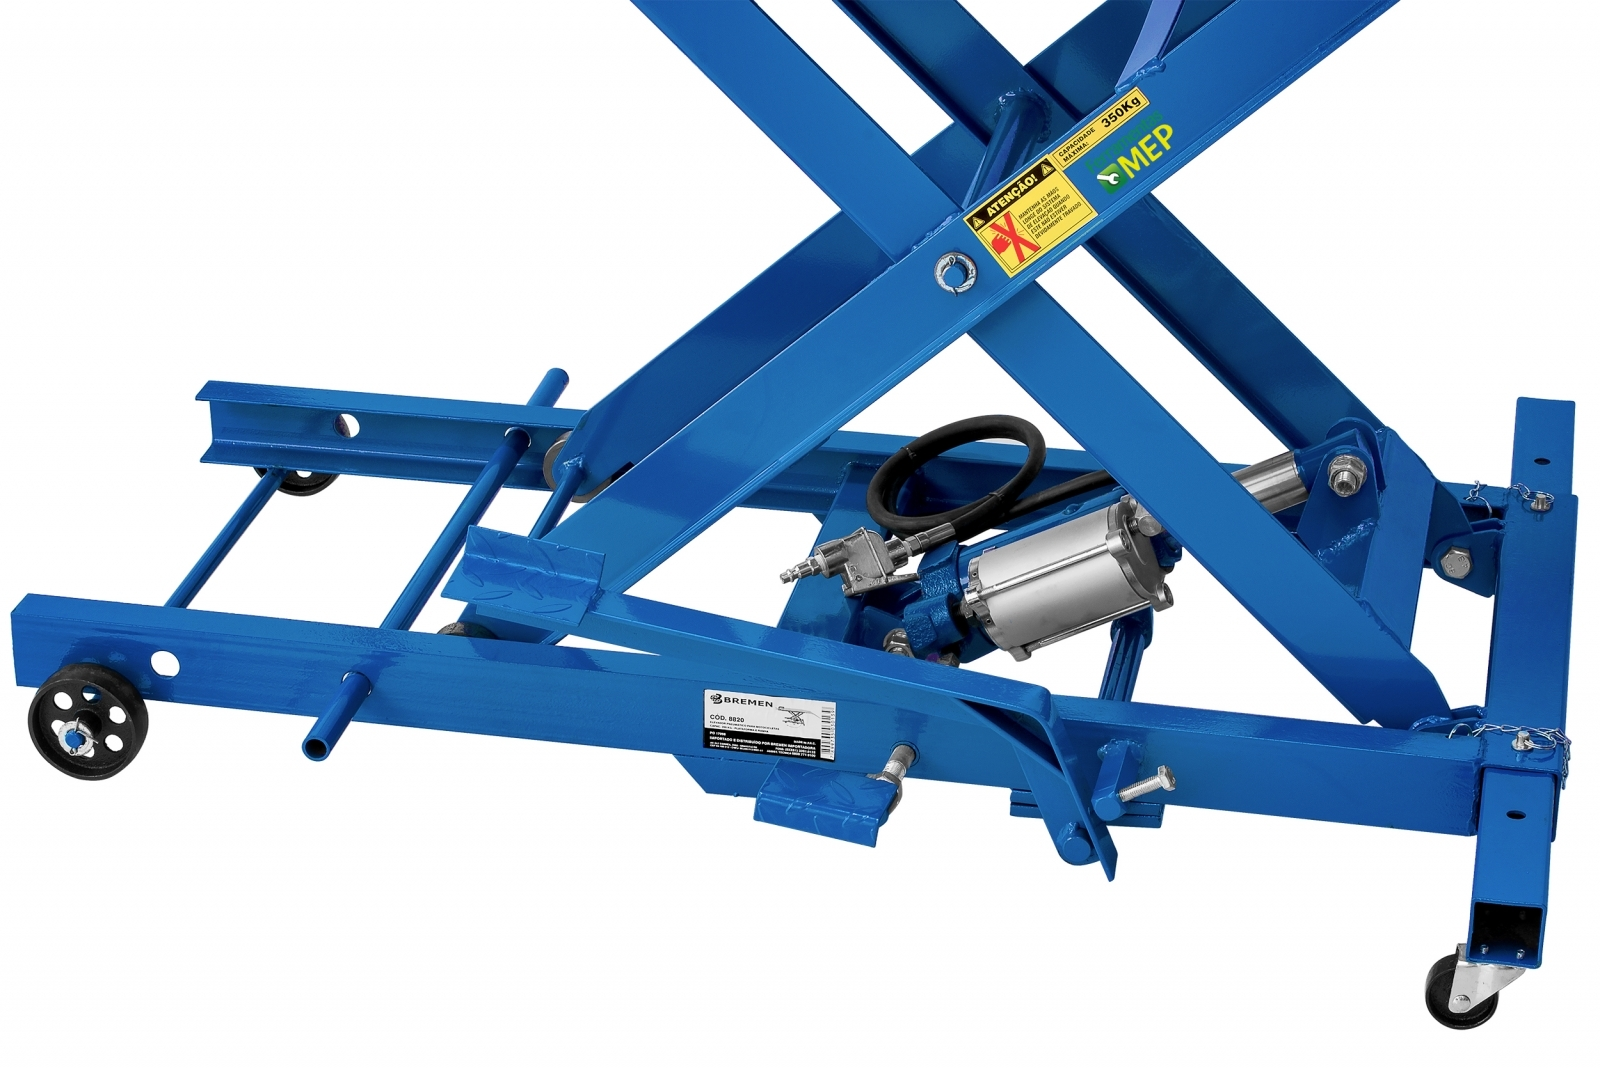 Elevador Rampa para Motocicleta Bremen 8820 capacidade 350kg - Ferramentas MEP